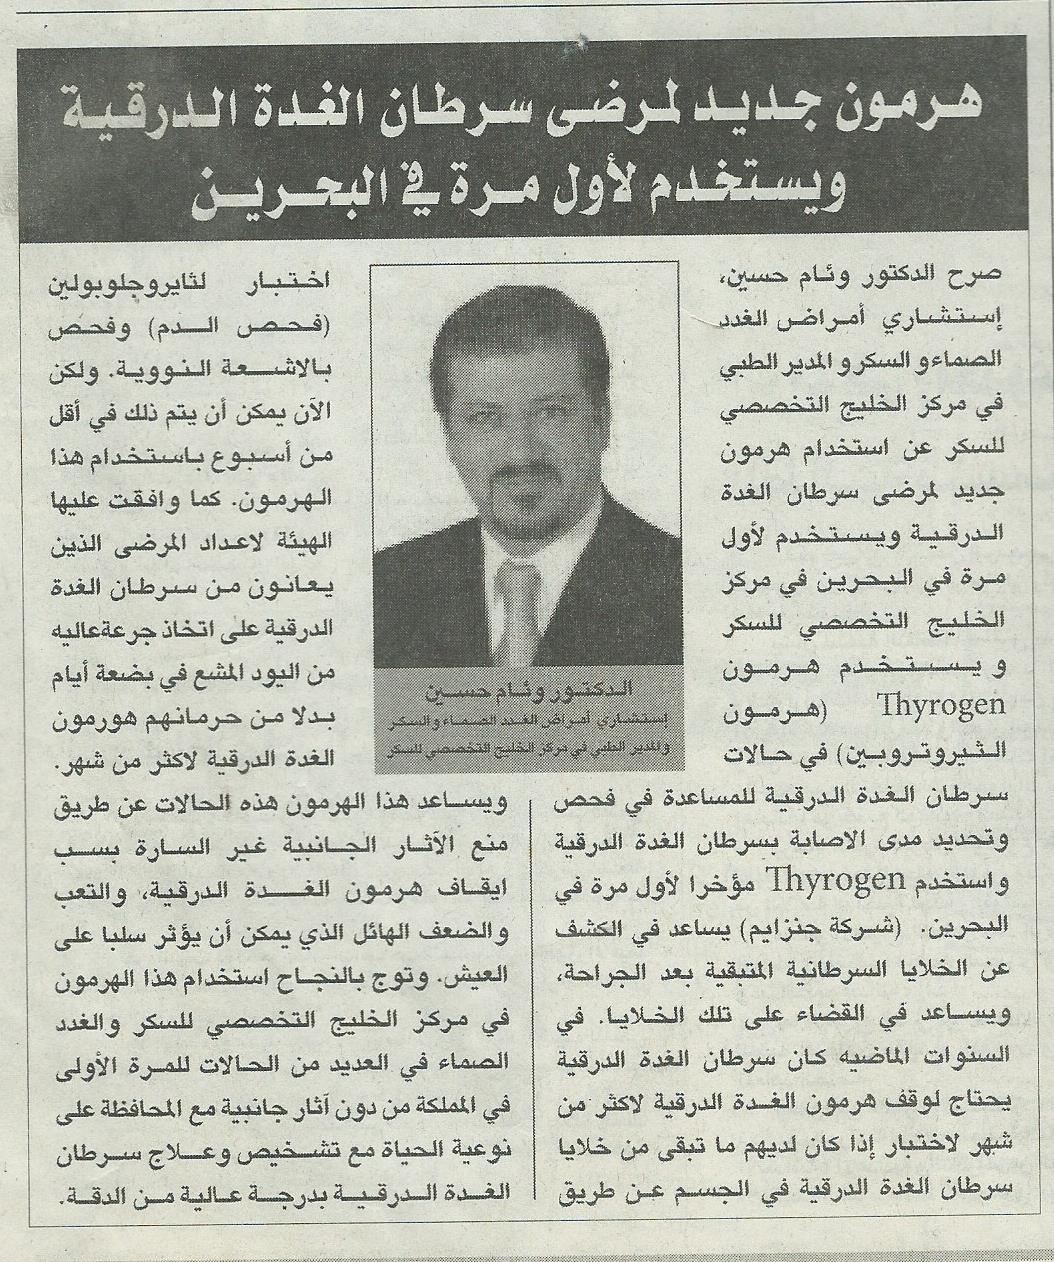 Thyroid cancer first time in Bahrain, Thyrogen